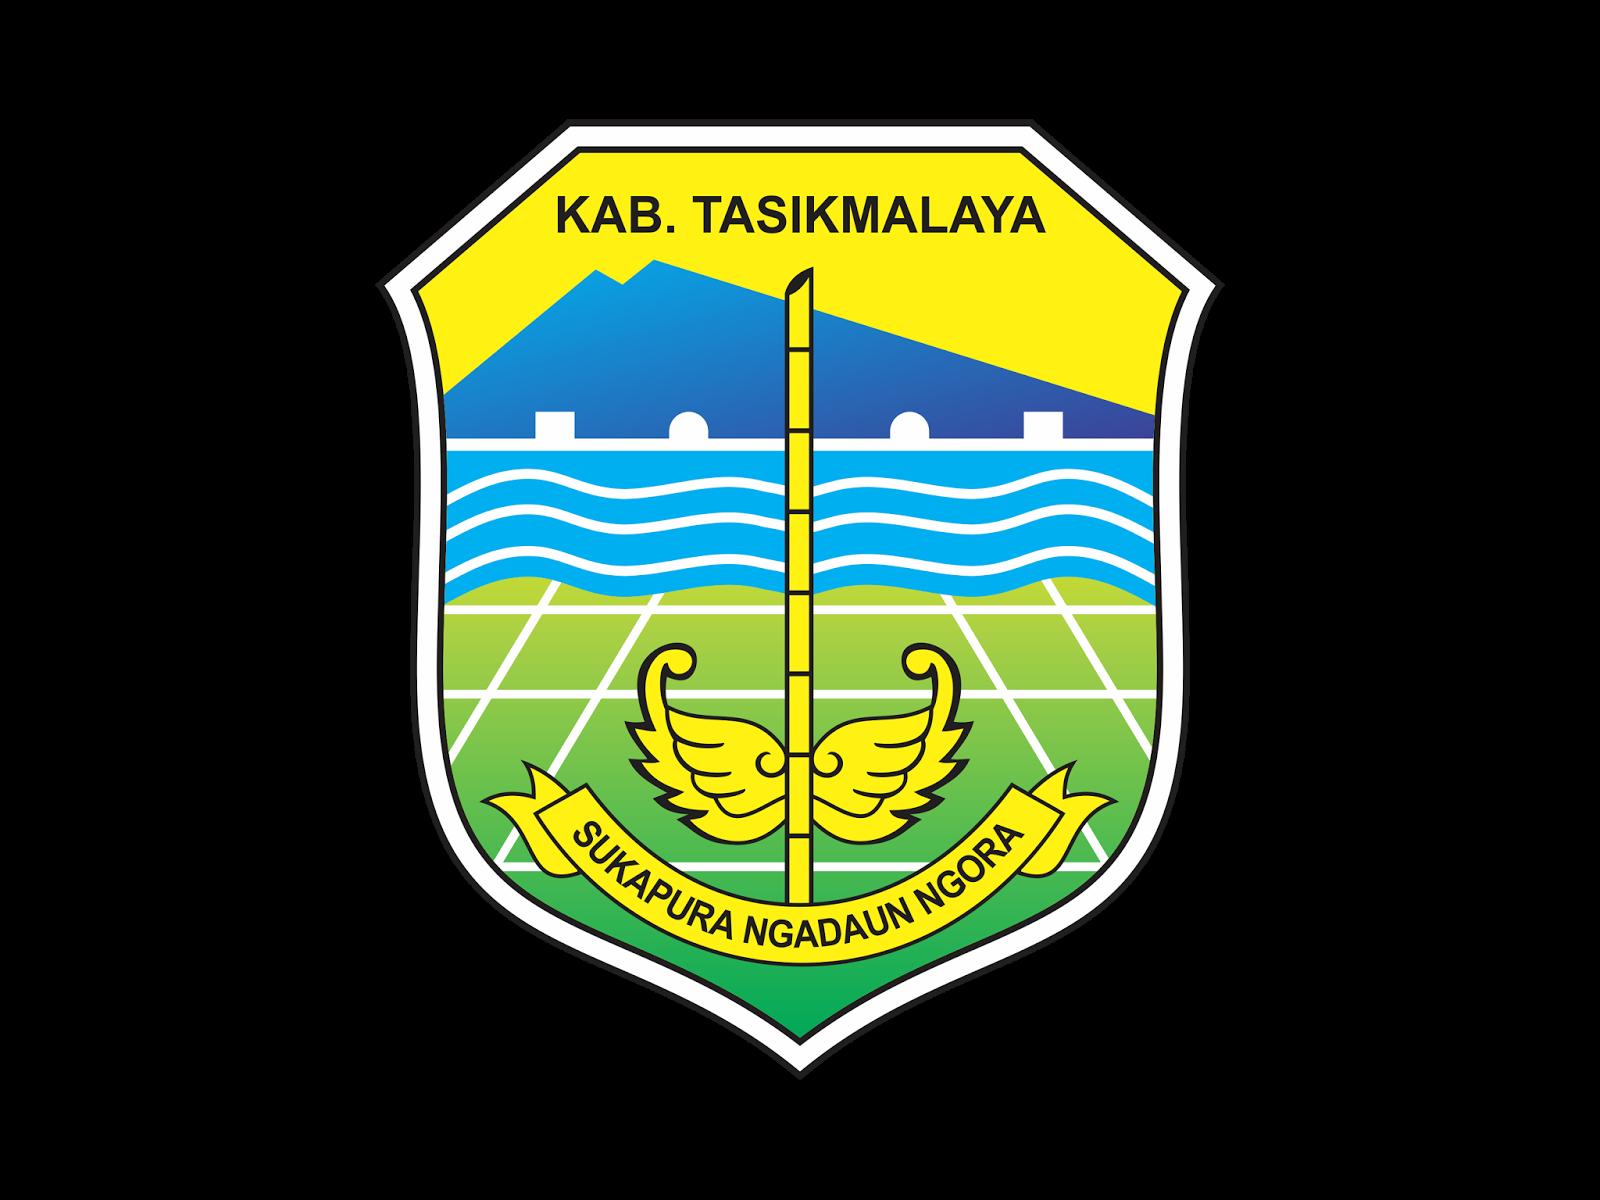 Logo Kabupaten Tasikmalaya Format Cdr Png Logo Vector